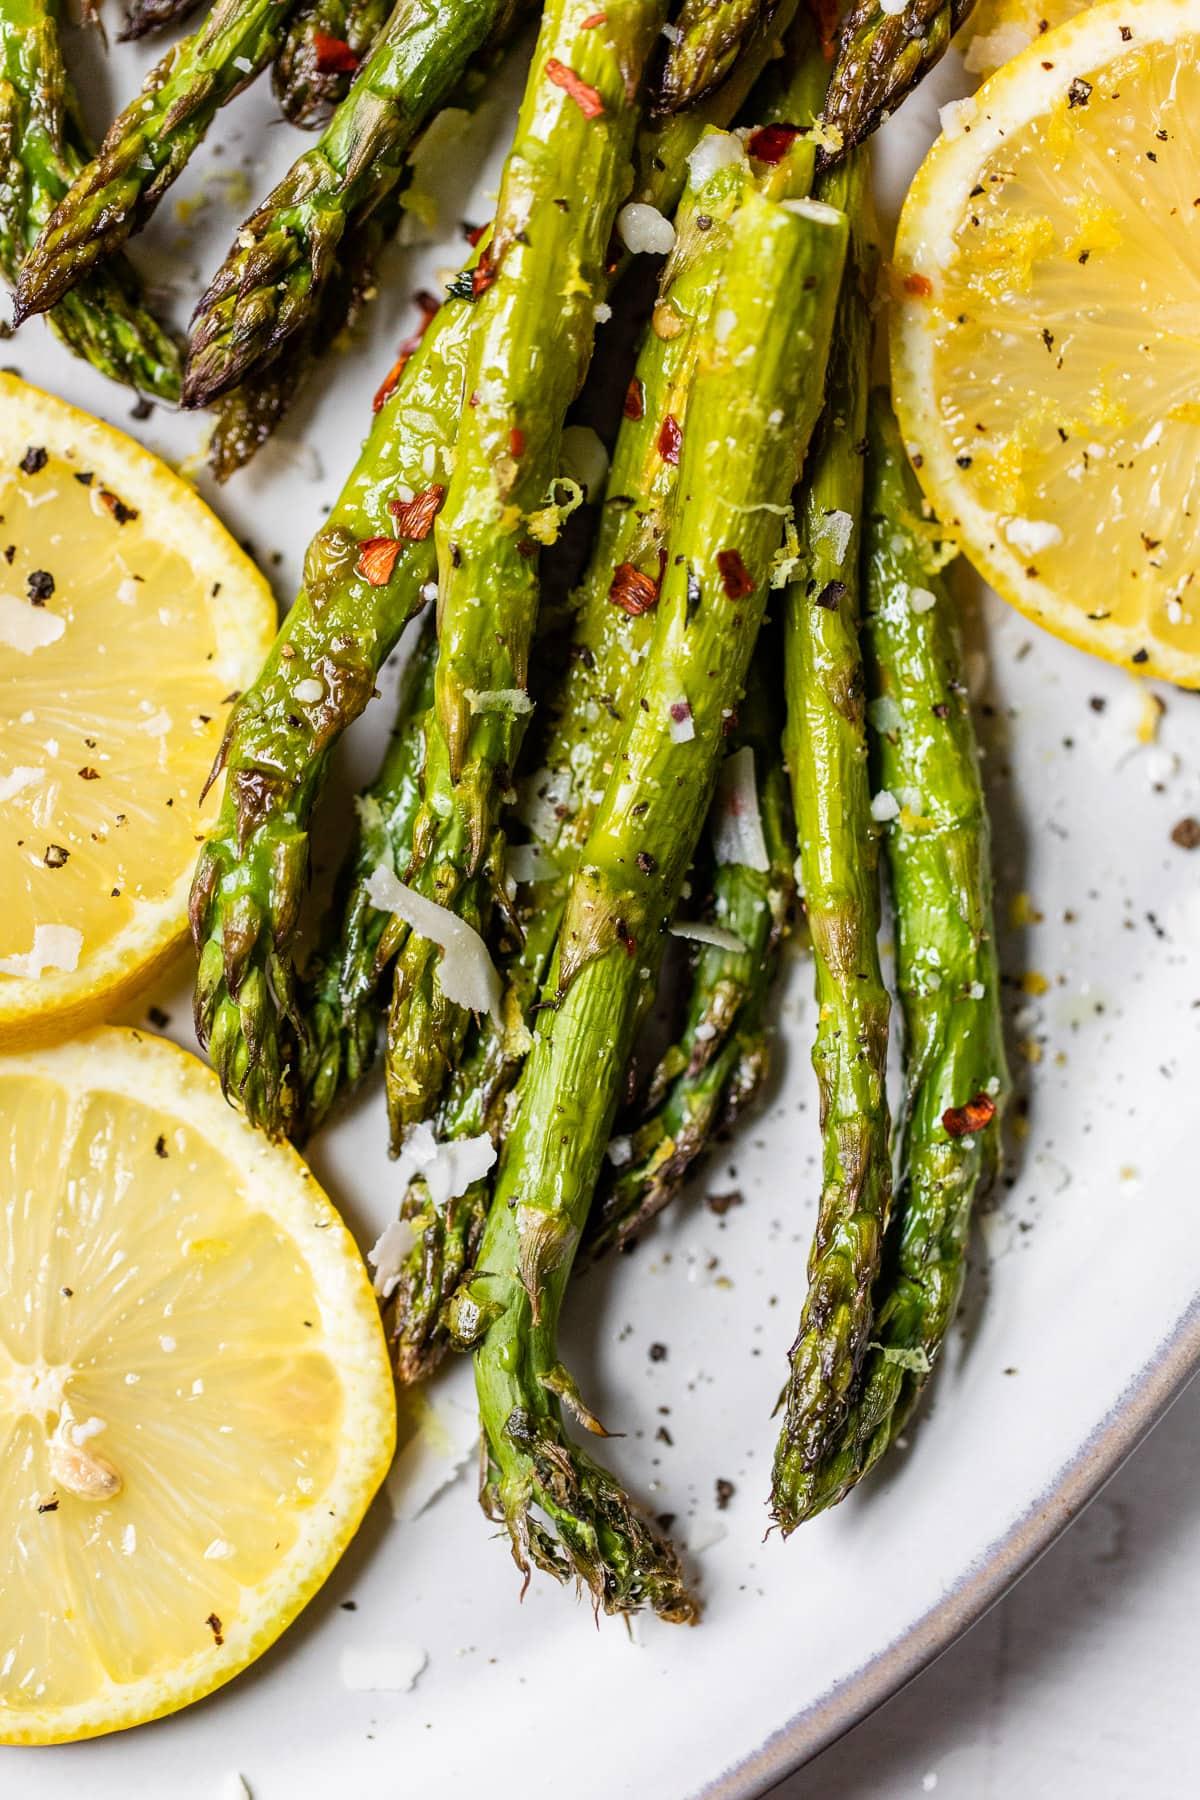 Parmesan roasted asparagus with lemon